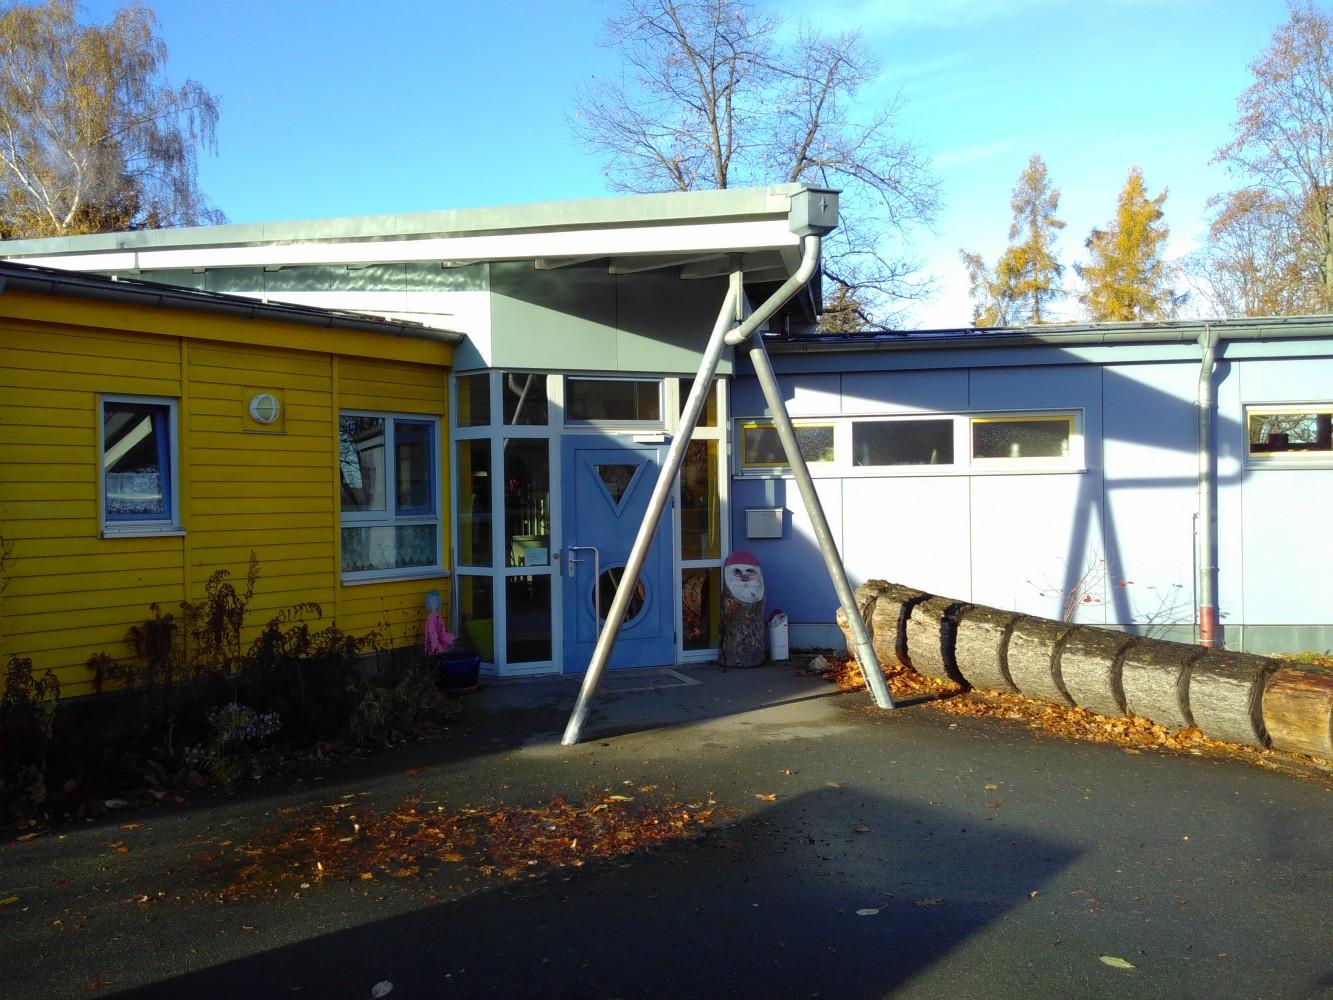 Eingang zum Nikolauskindergarten